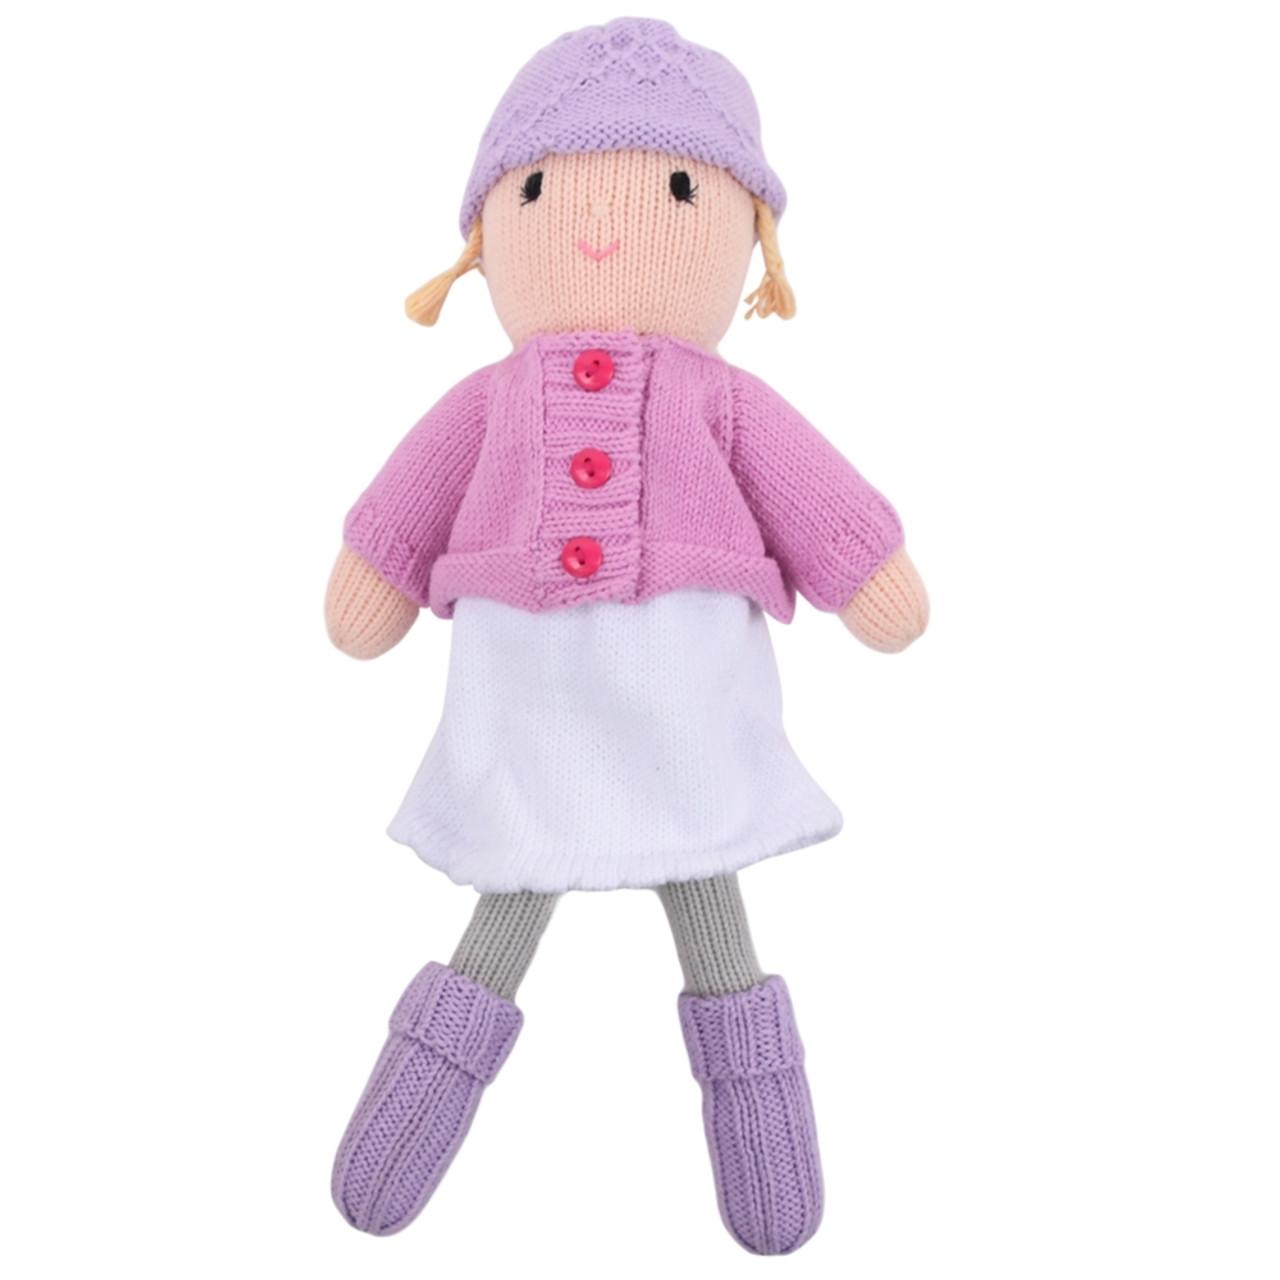 Organic Stuffed Doll - Gretchen